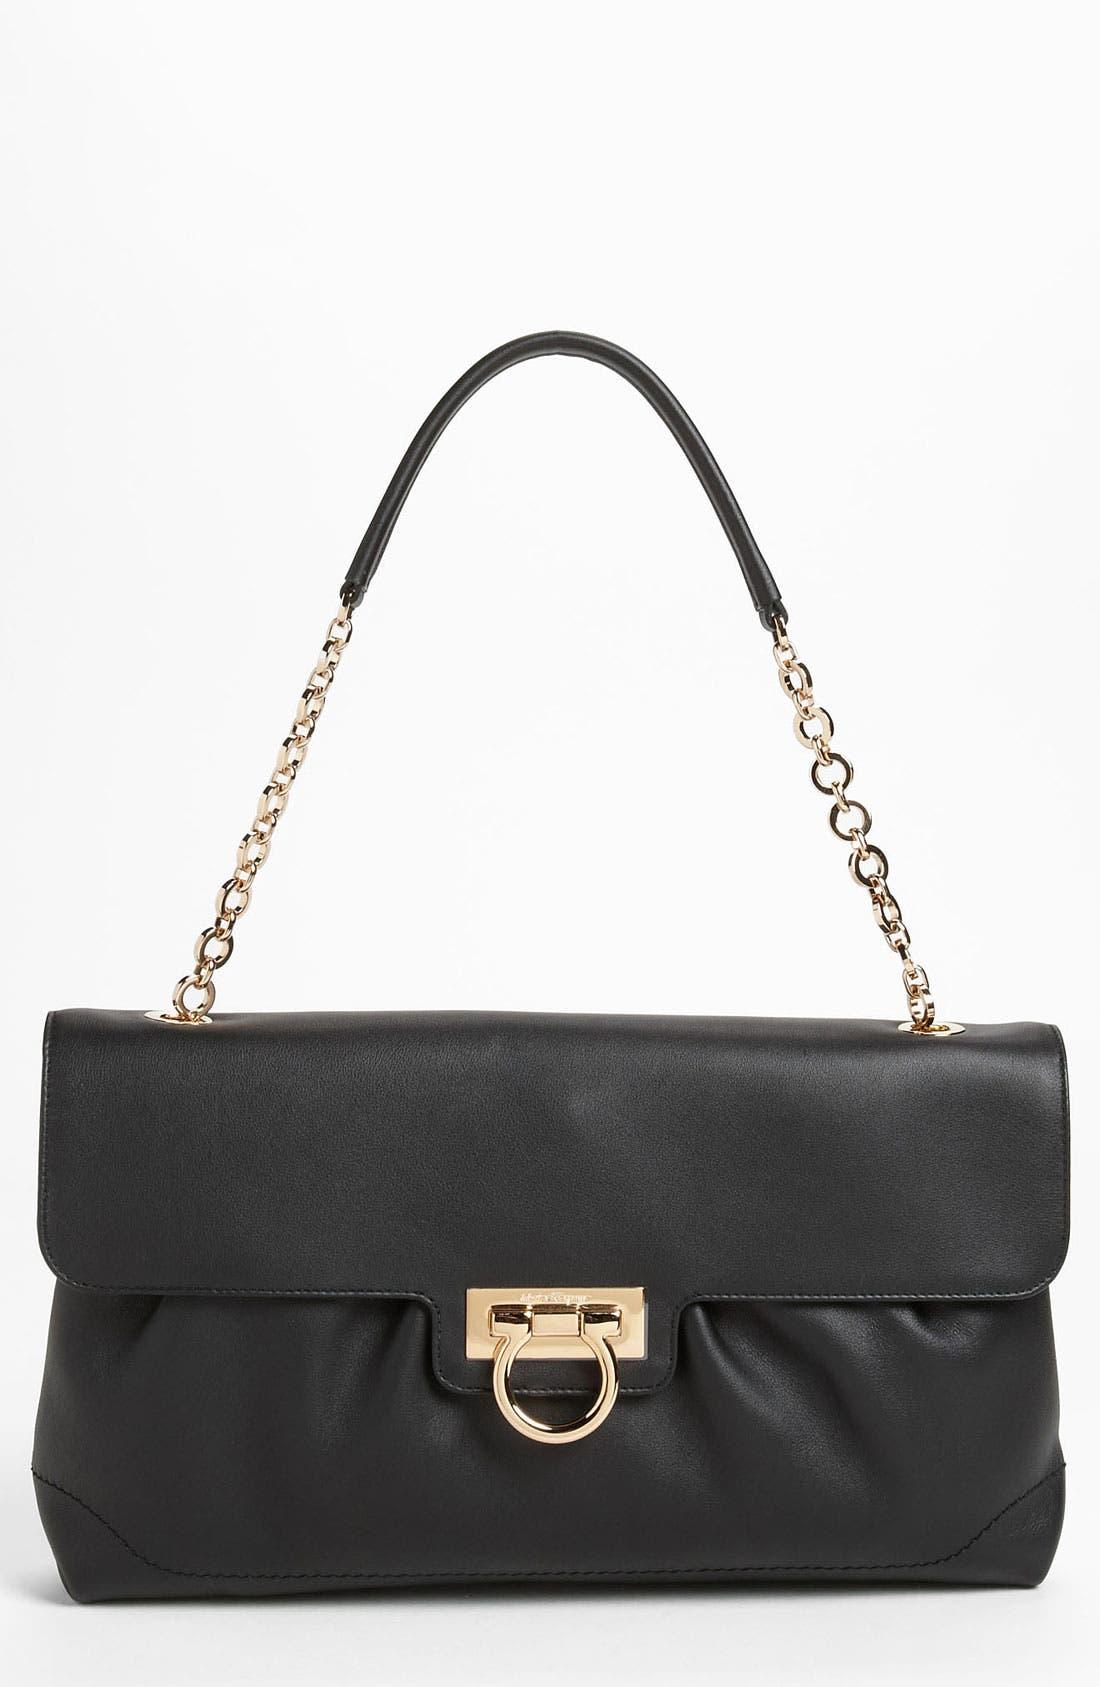 Alternate Image 1 Selected - Salvatore Ferragamo Chain Strap Leather Shoulder Bag